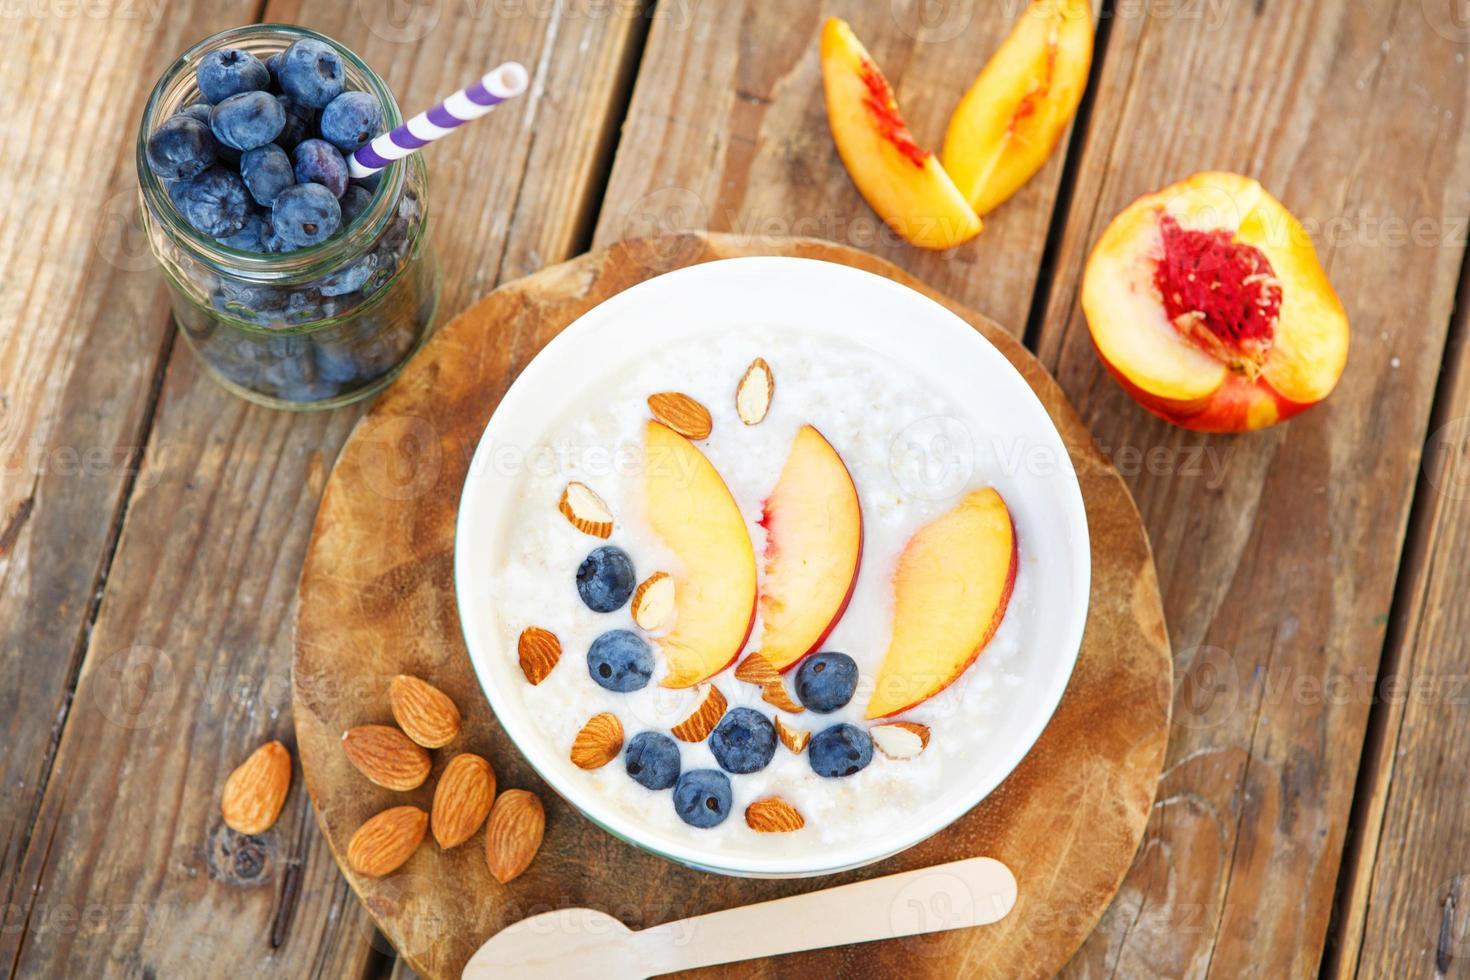 Granola with fresh organic blueberries, nectarines and almonds photo